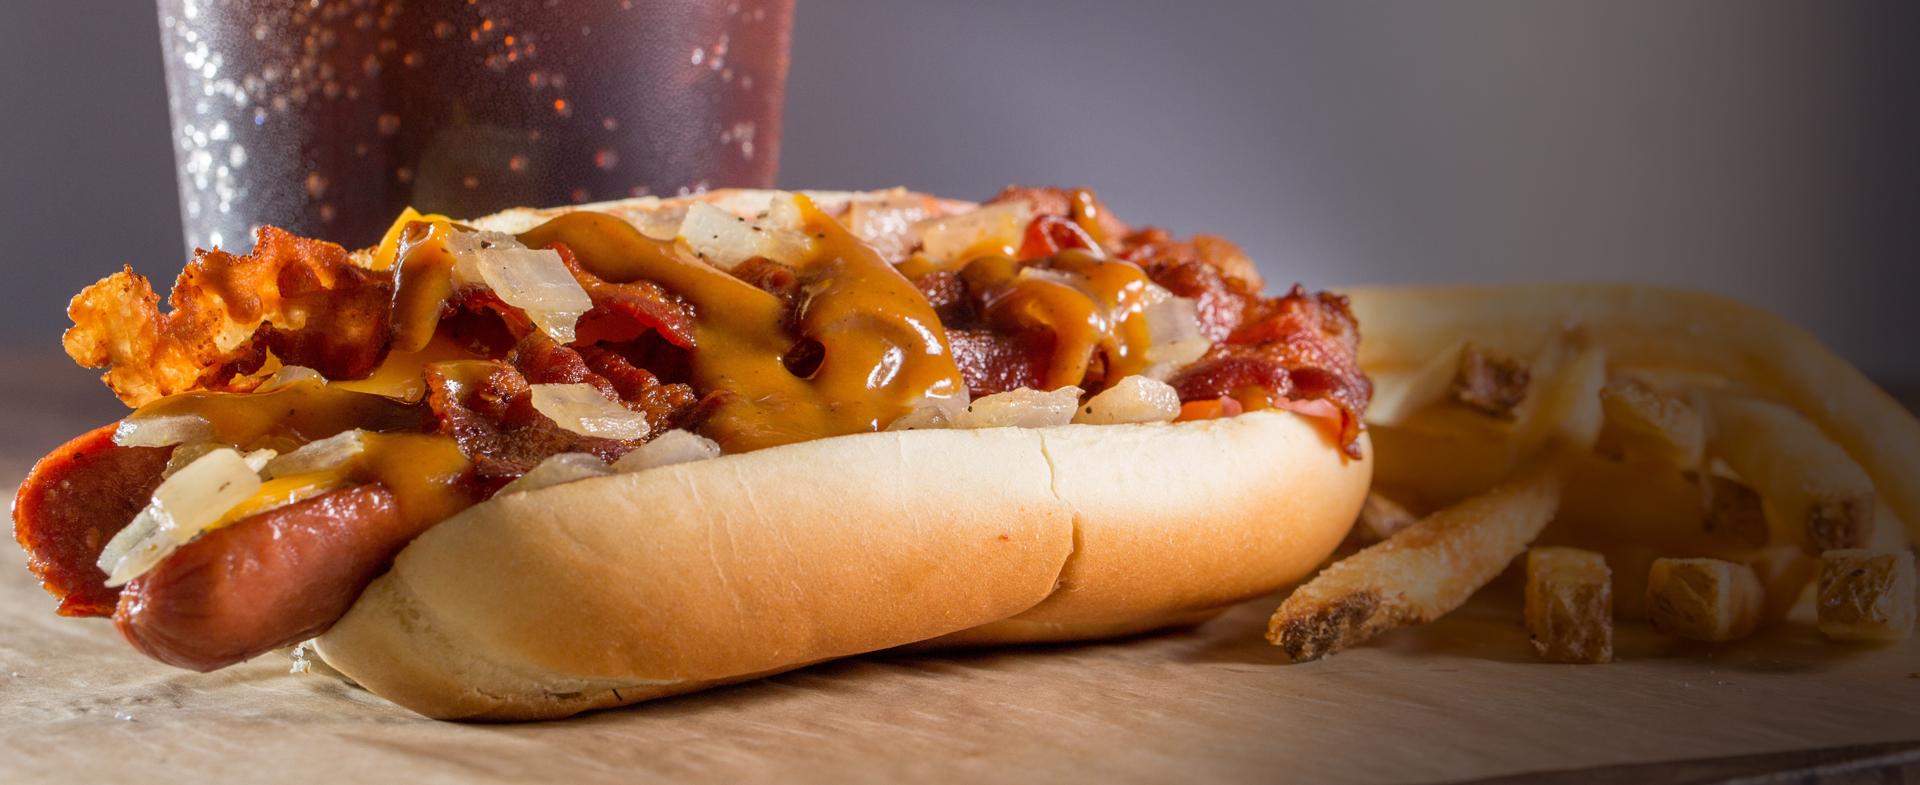 Bacon Stuffed Hot Dog